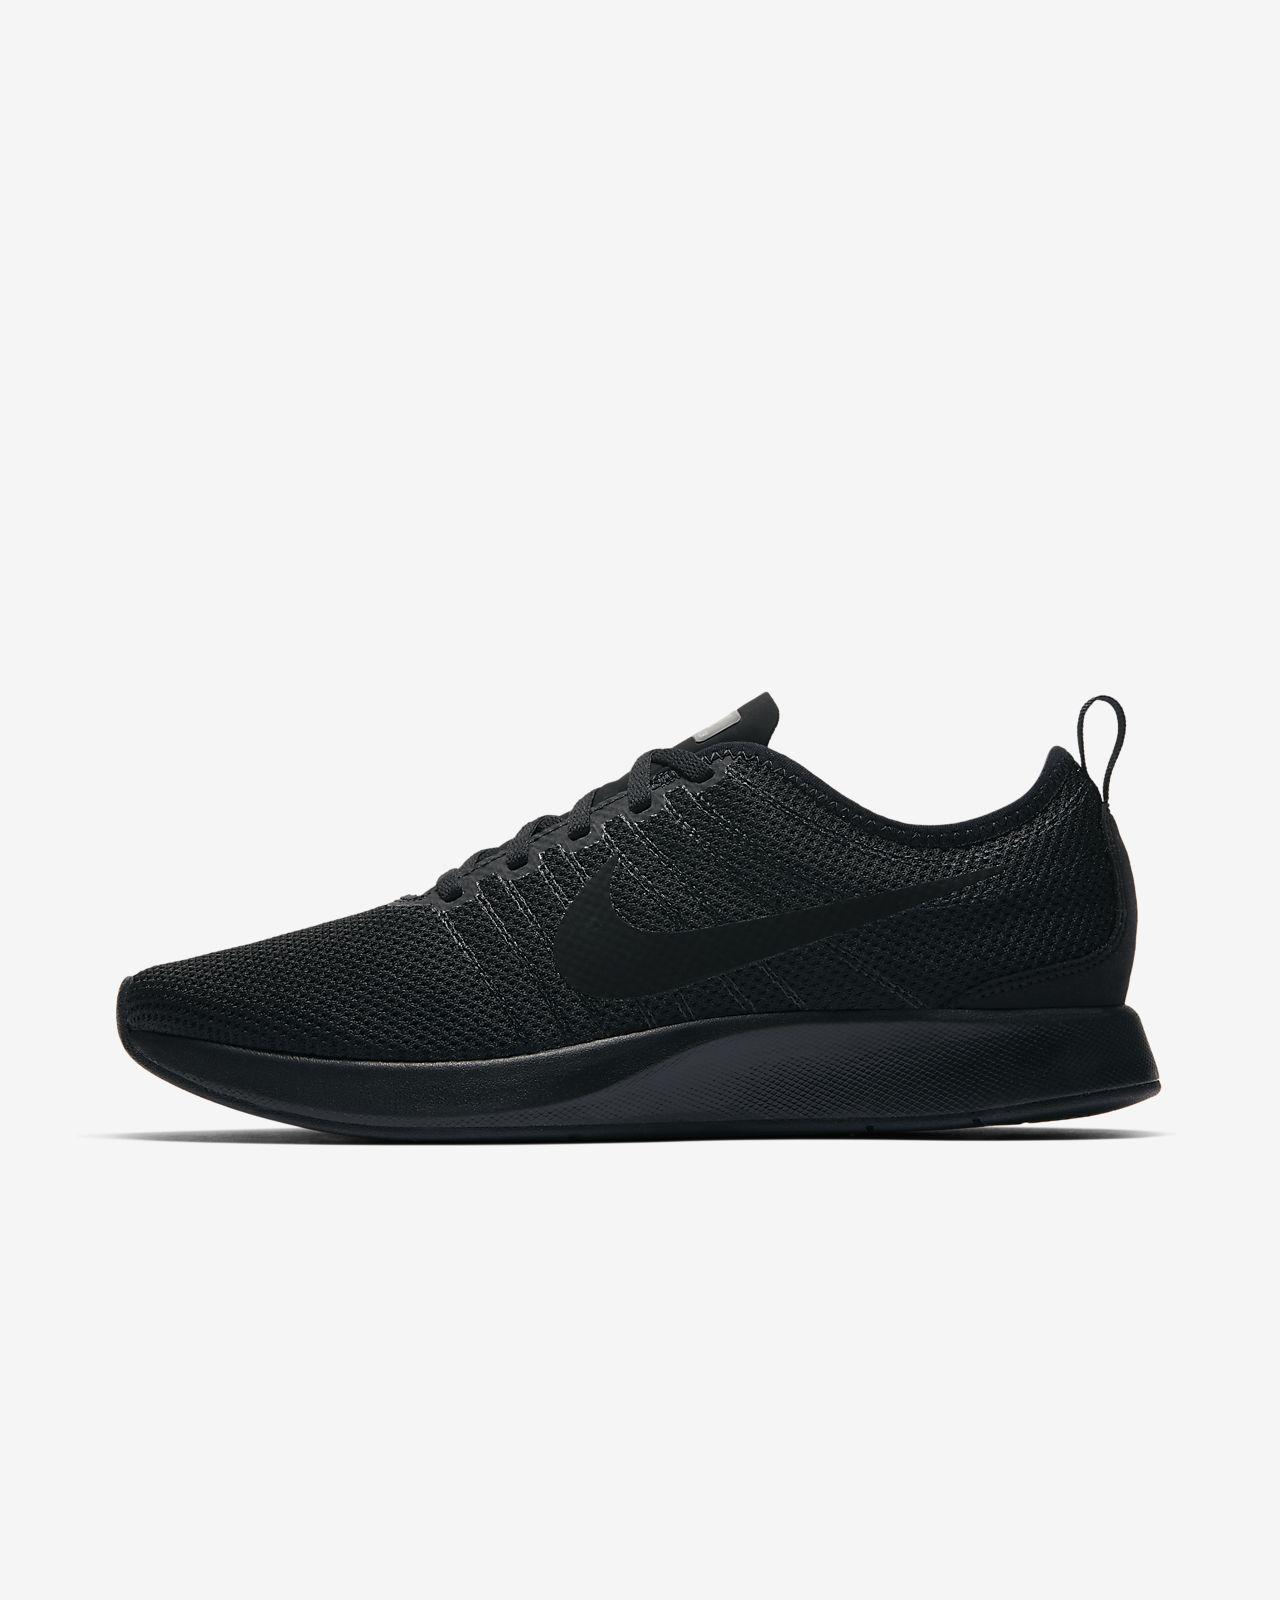 Hommes Dualtone Chaussures De Sport De Course, Blu, Nike 40 Eu